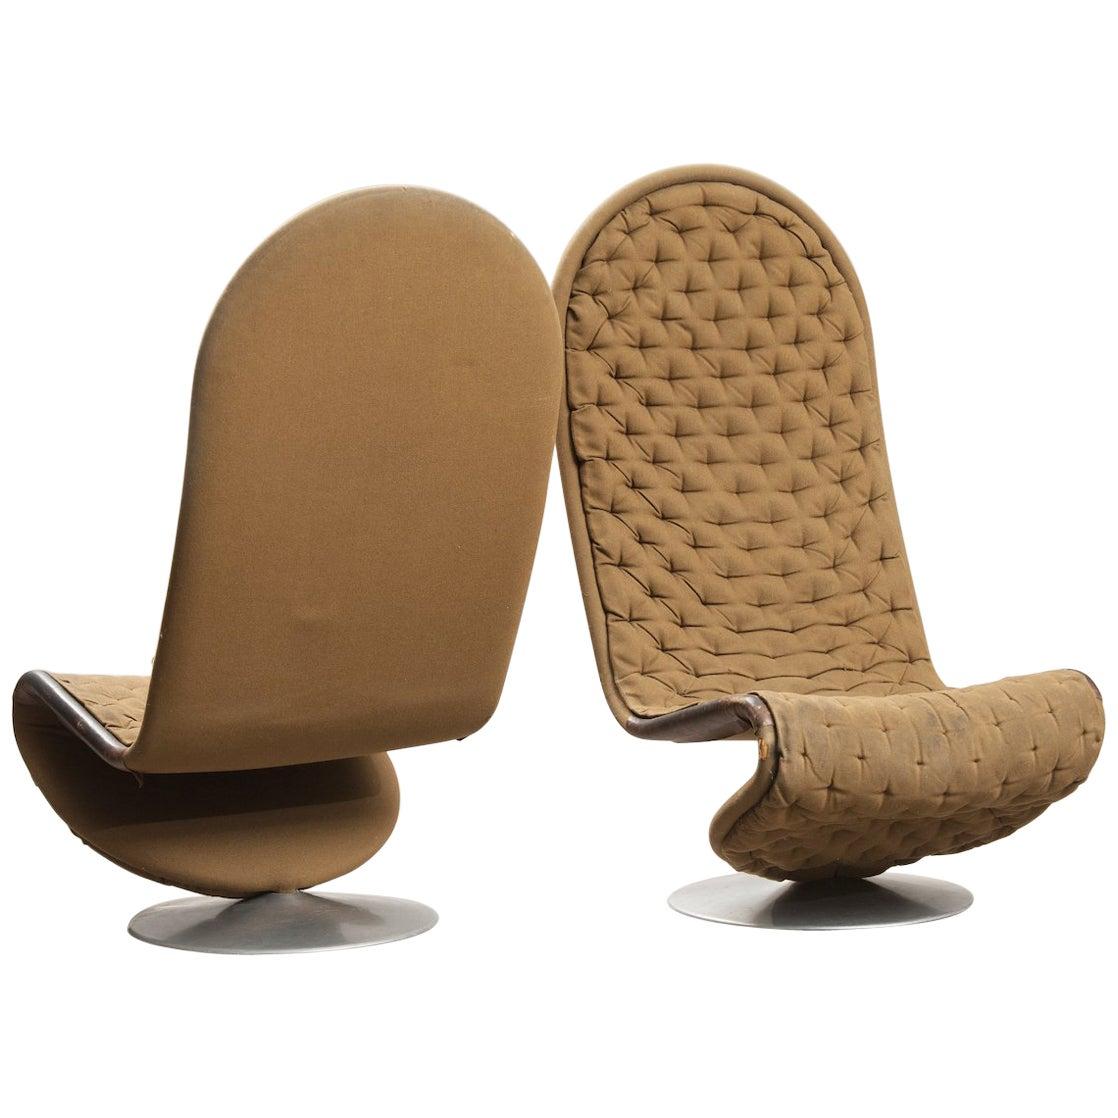 Verner Panton 'System 1-2-3 De Luxe' Lounge Chairs, for Fritz Hansen, Denmark